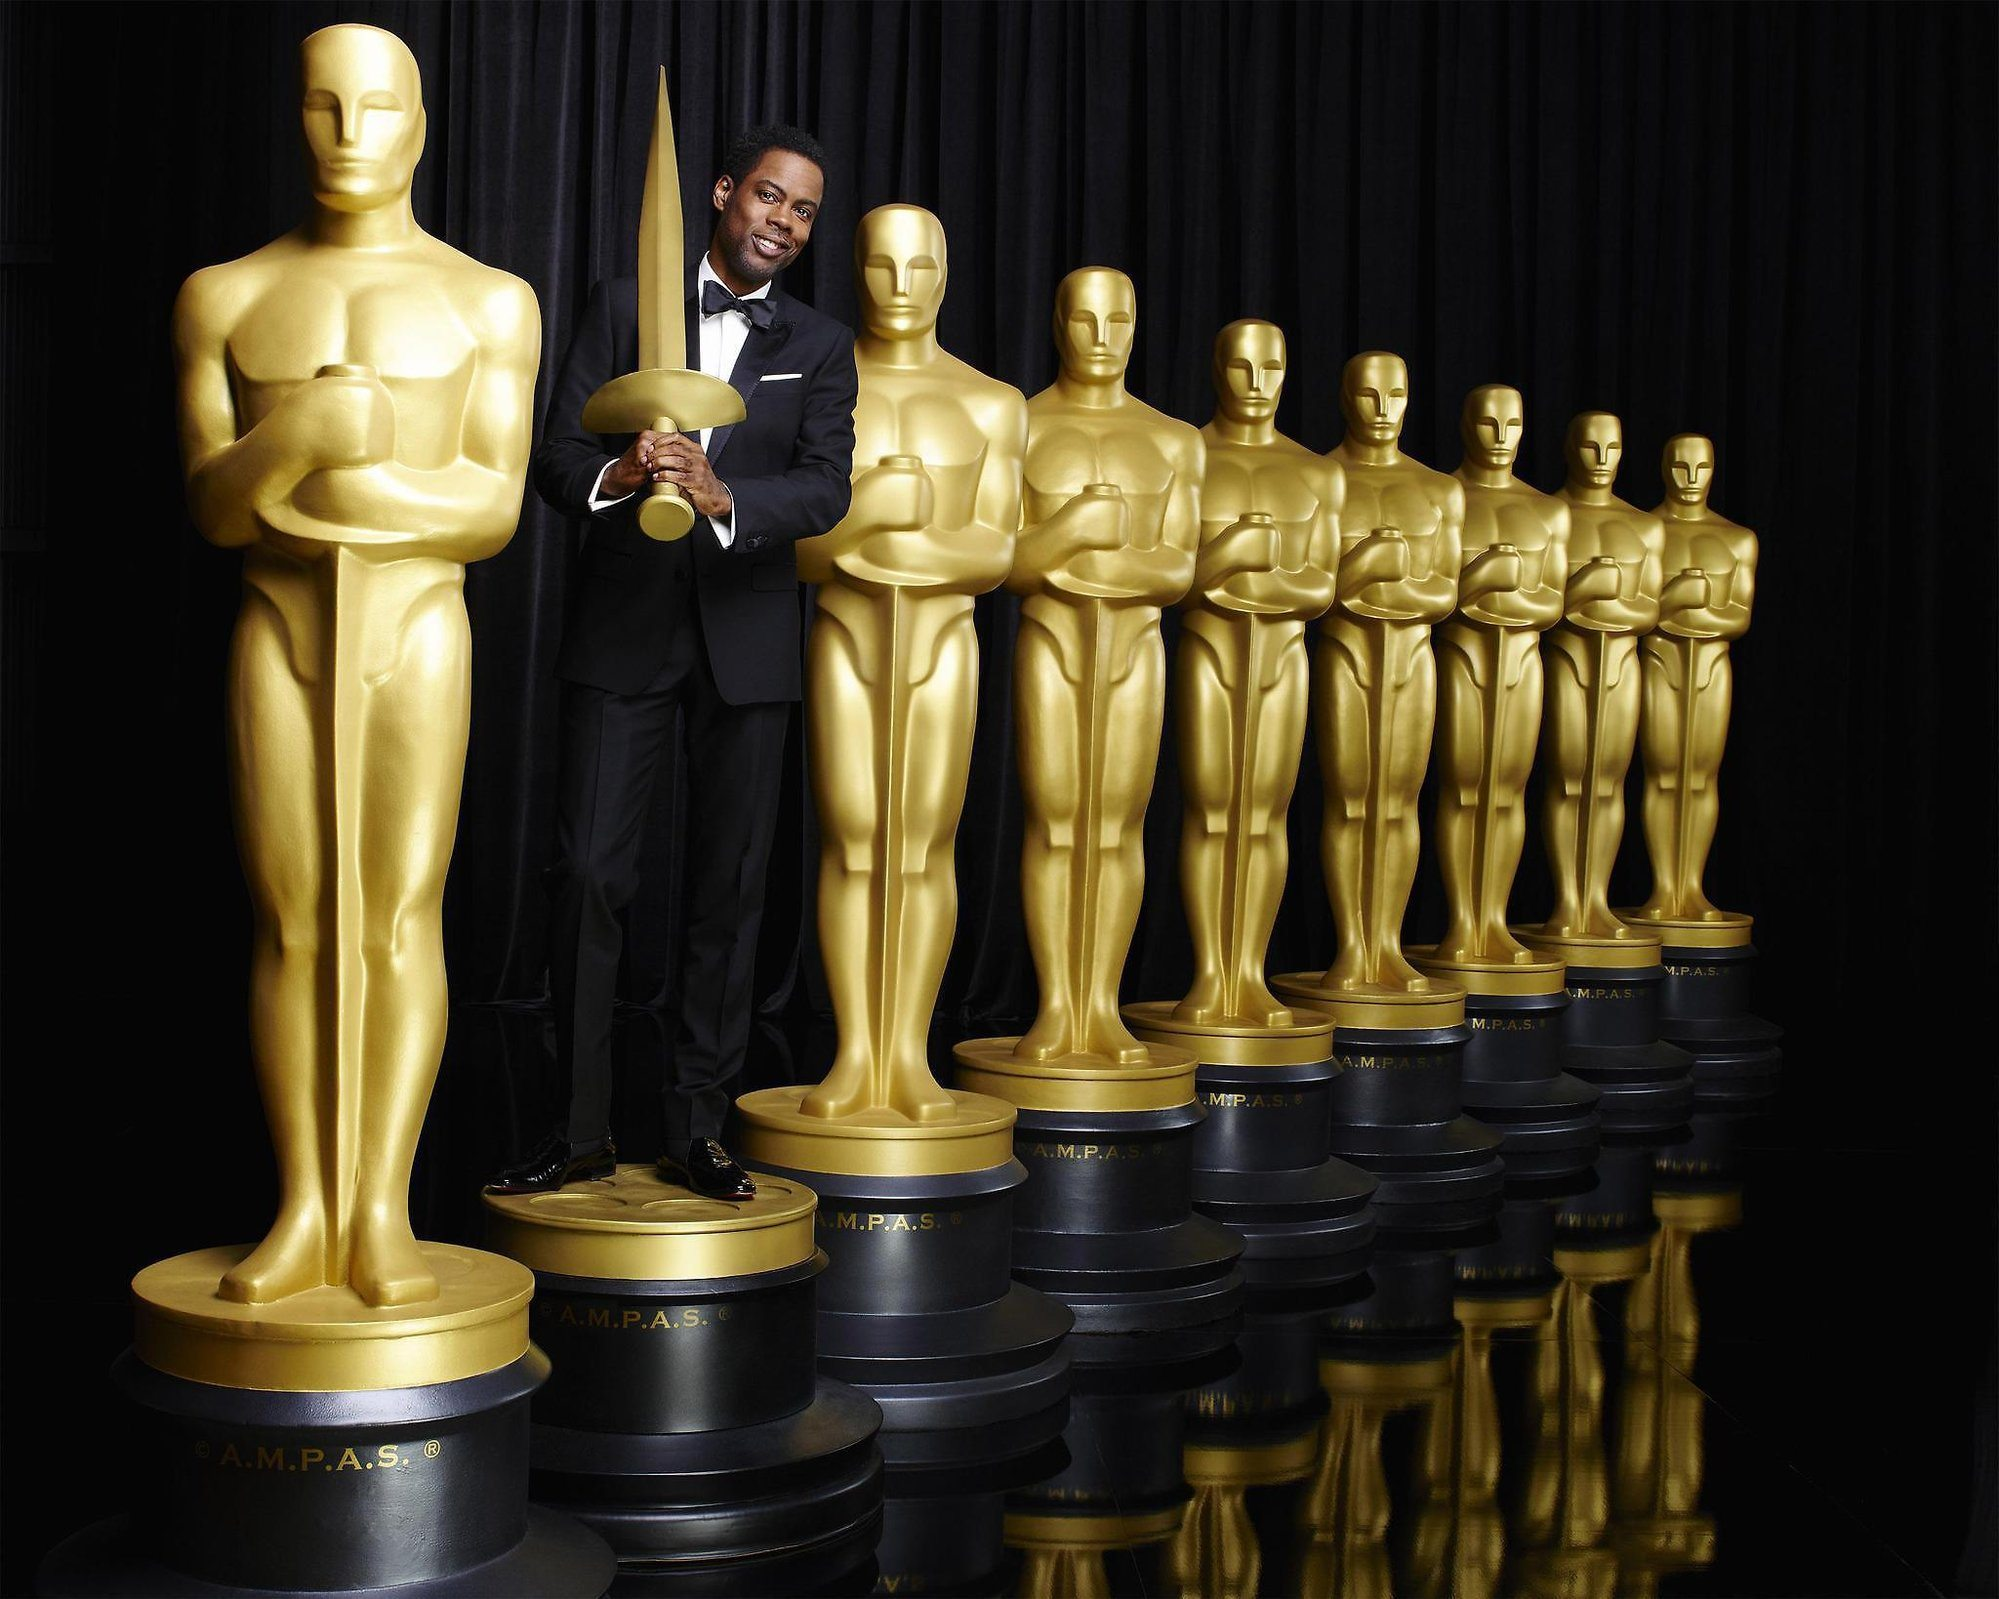 Academy Awards, When art is colour blind